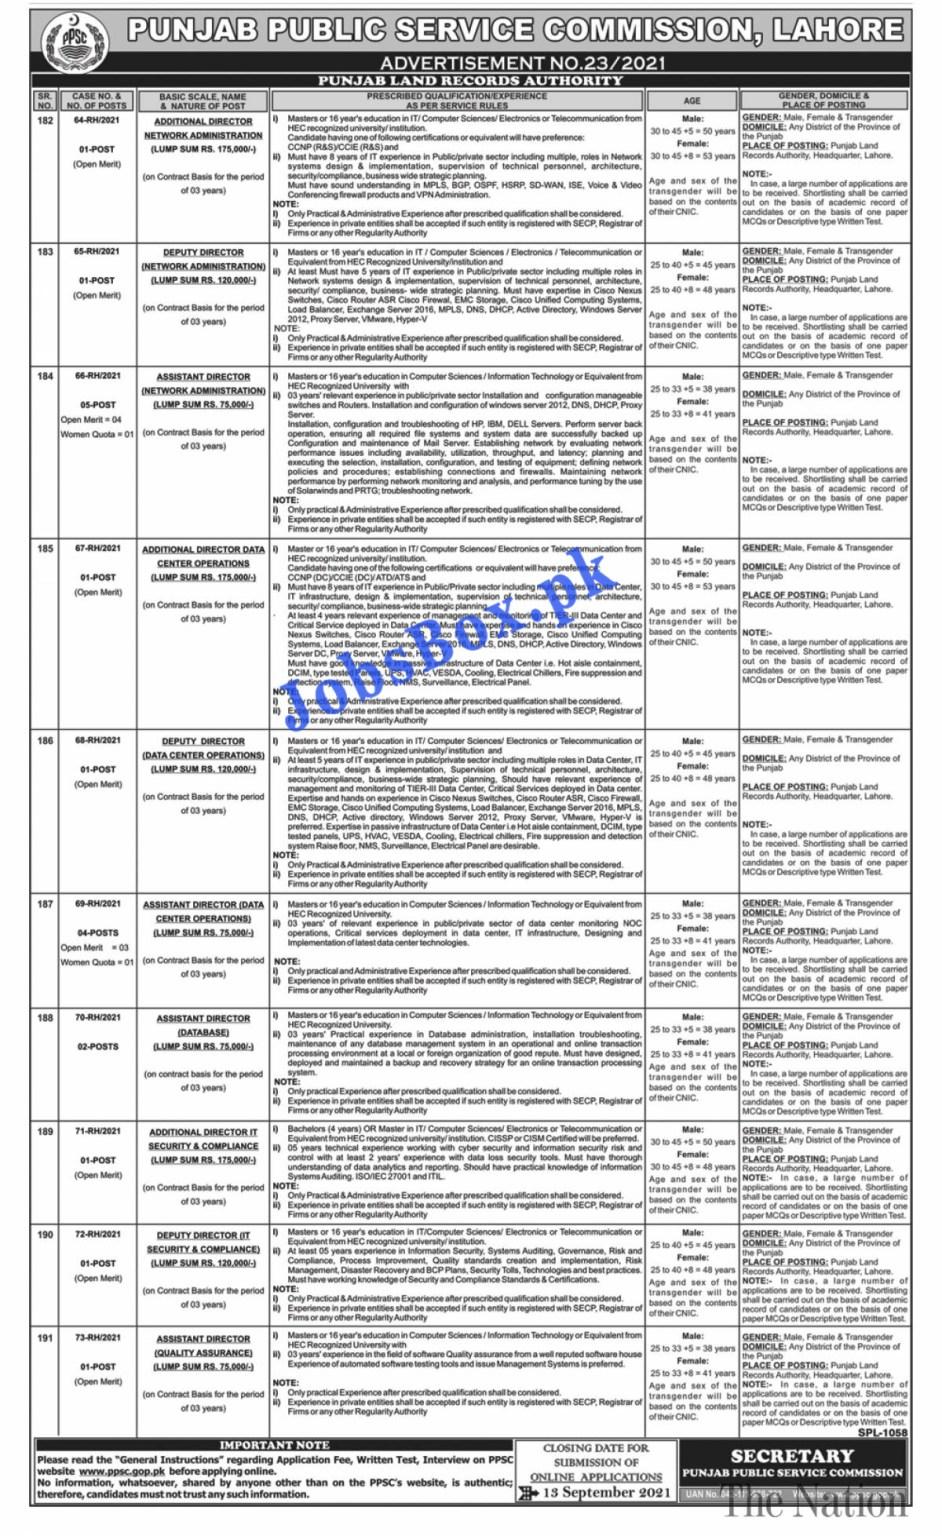 PPSC Jobs 2021    PPSC Jobs 2021 Online Application Form    www.PPSC.Com